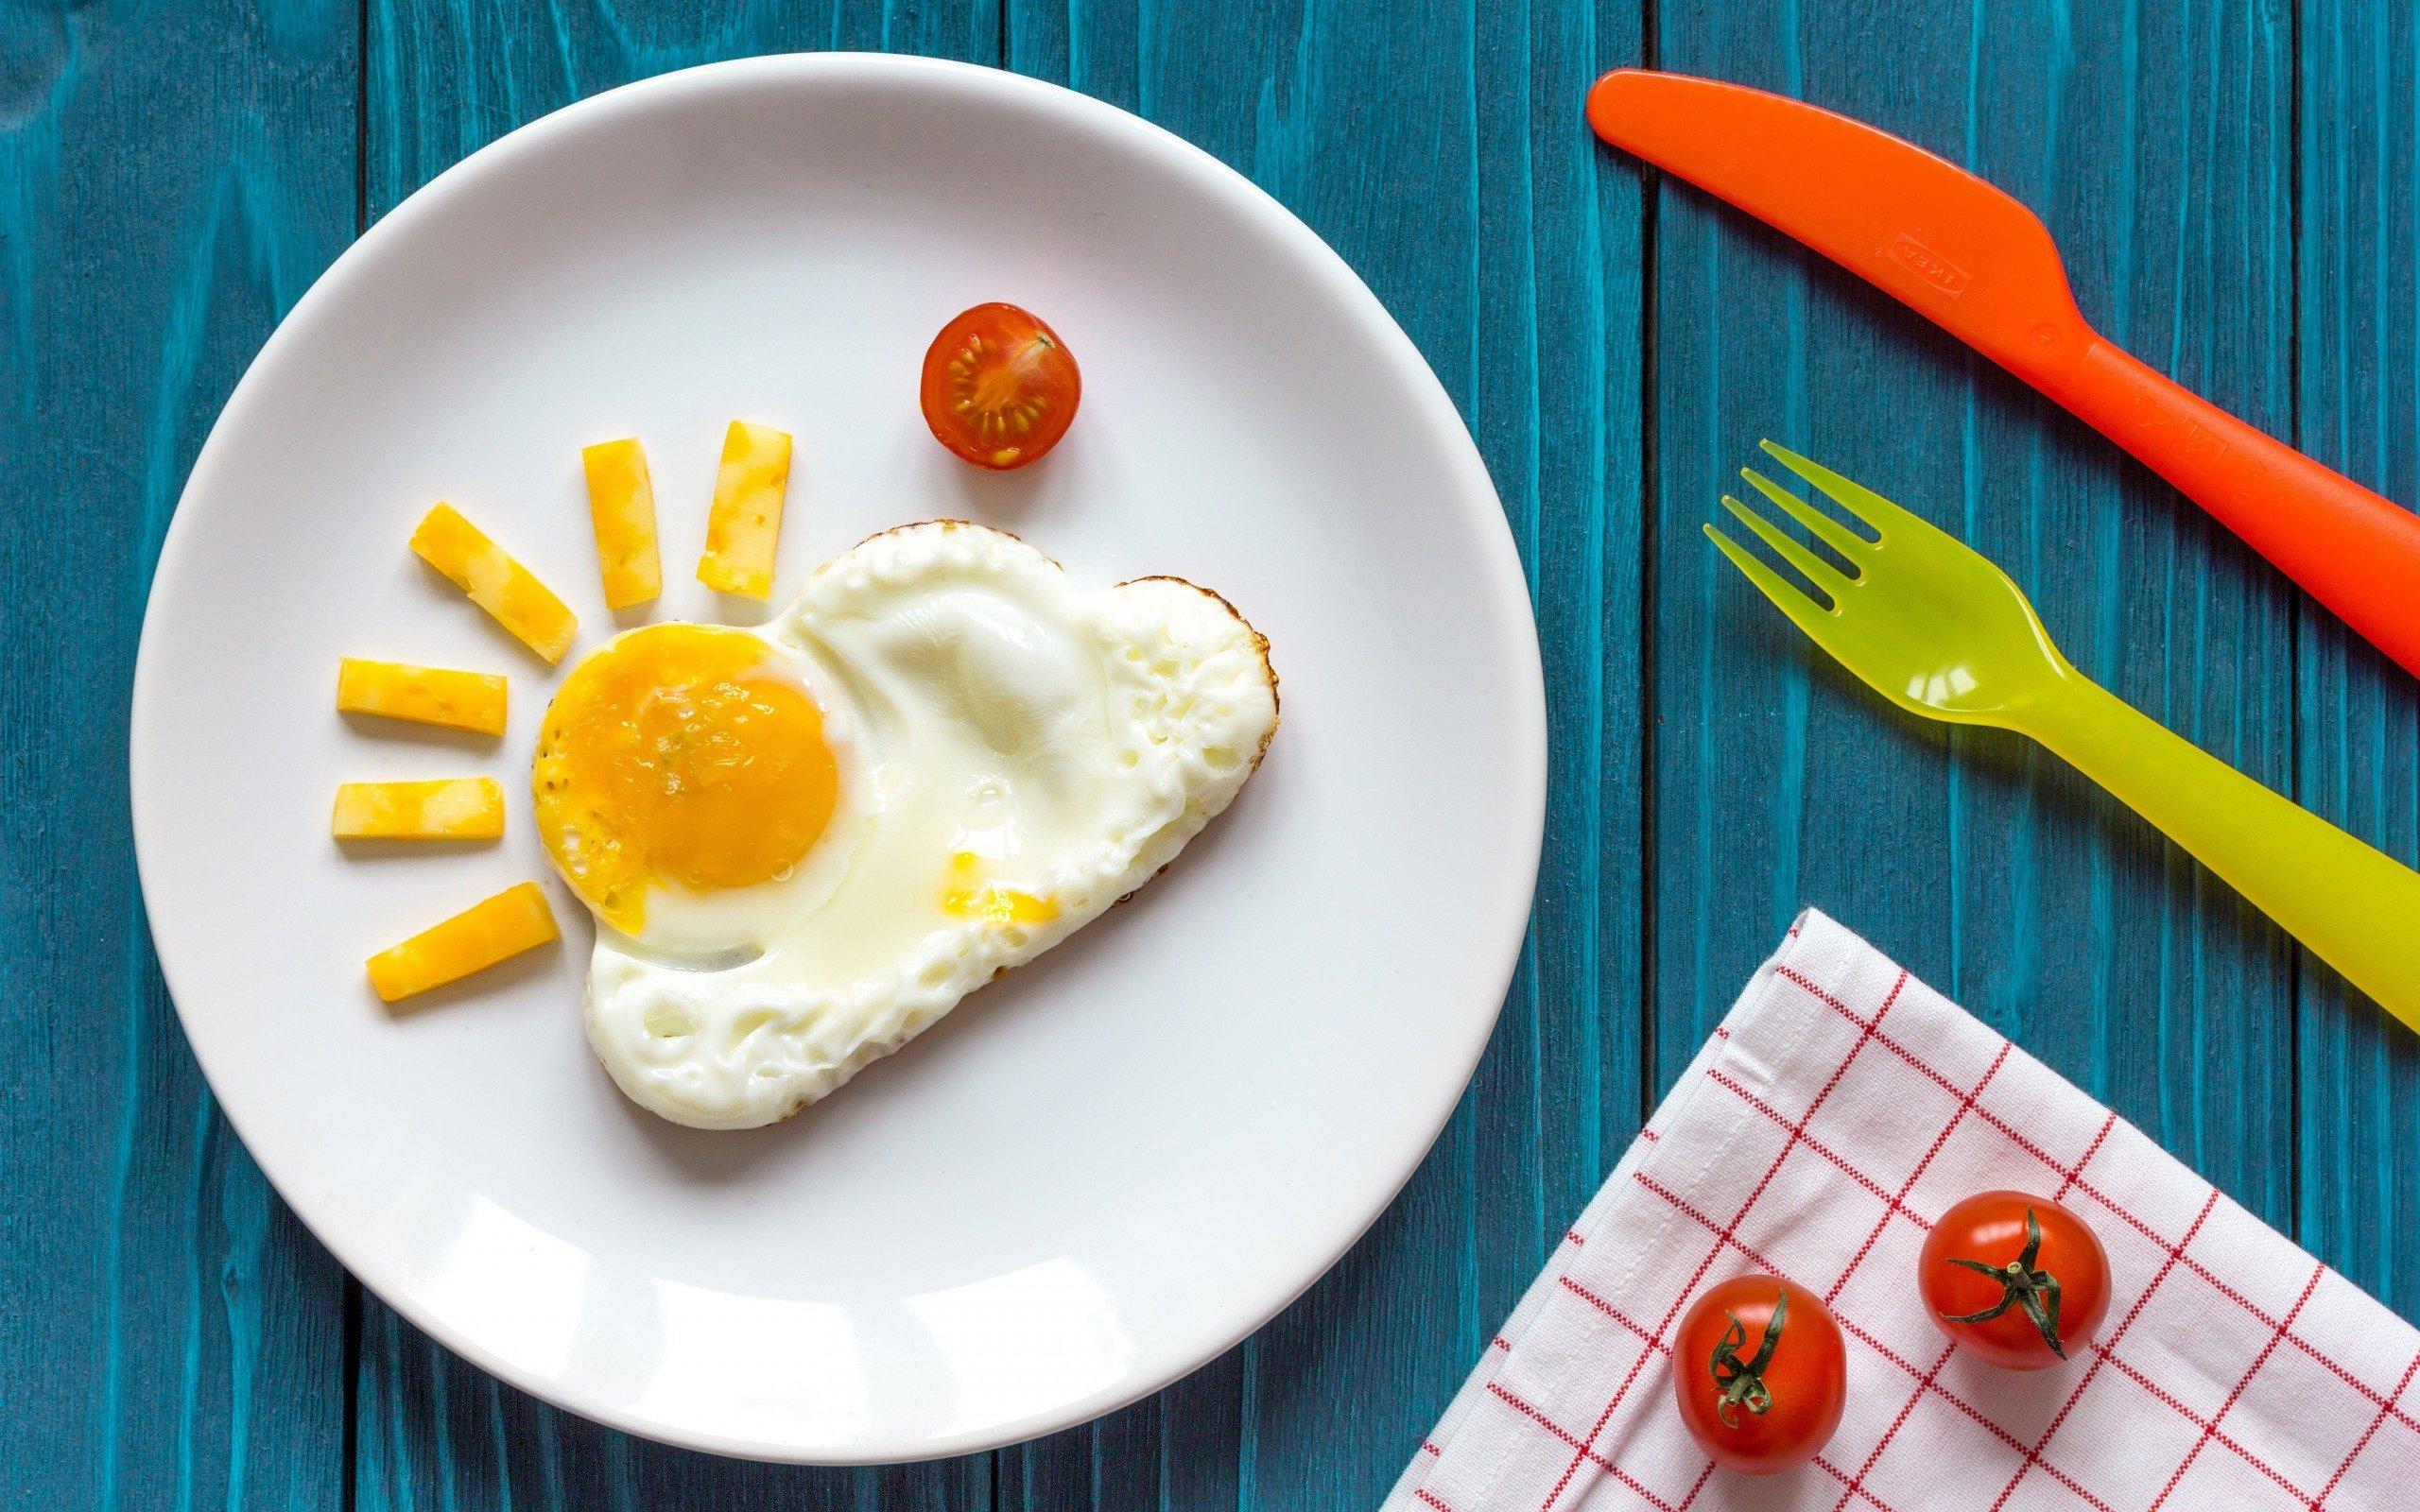 общей яичница доброе утро картинки через